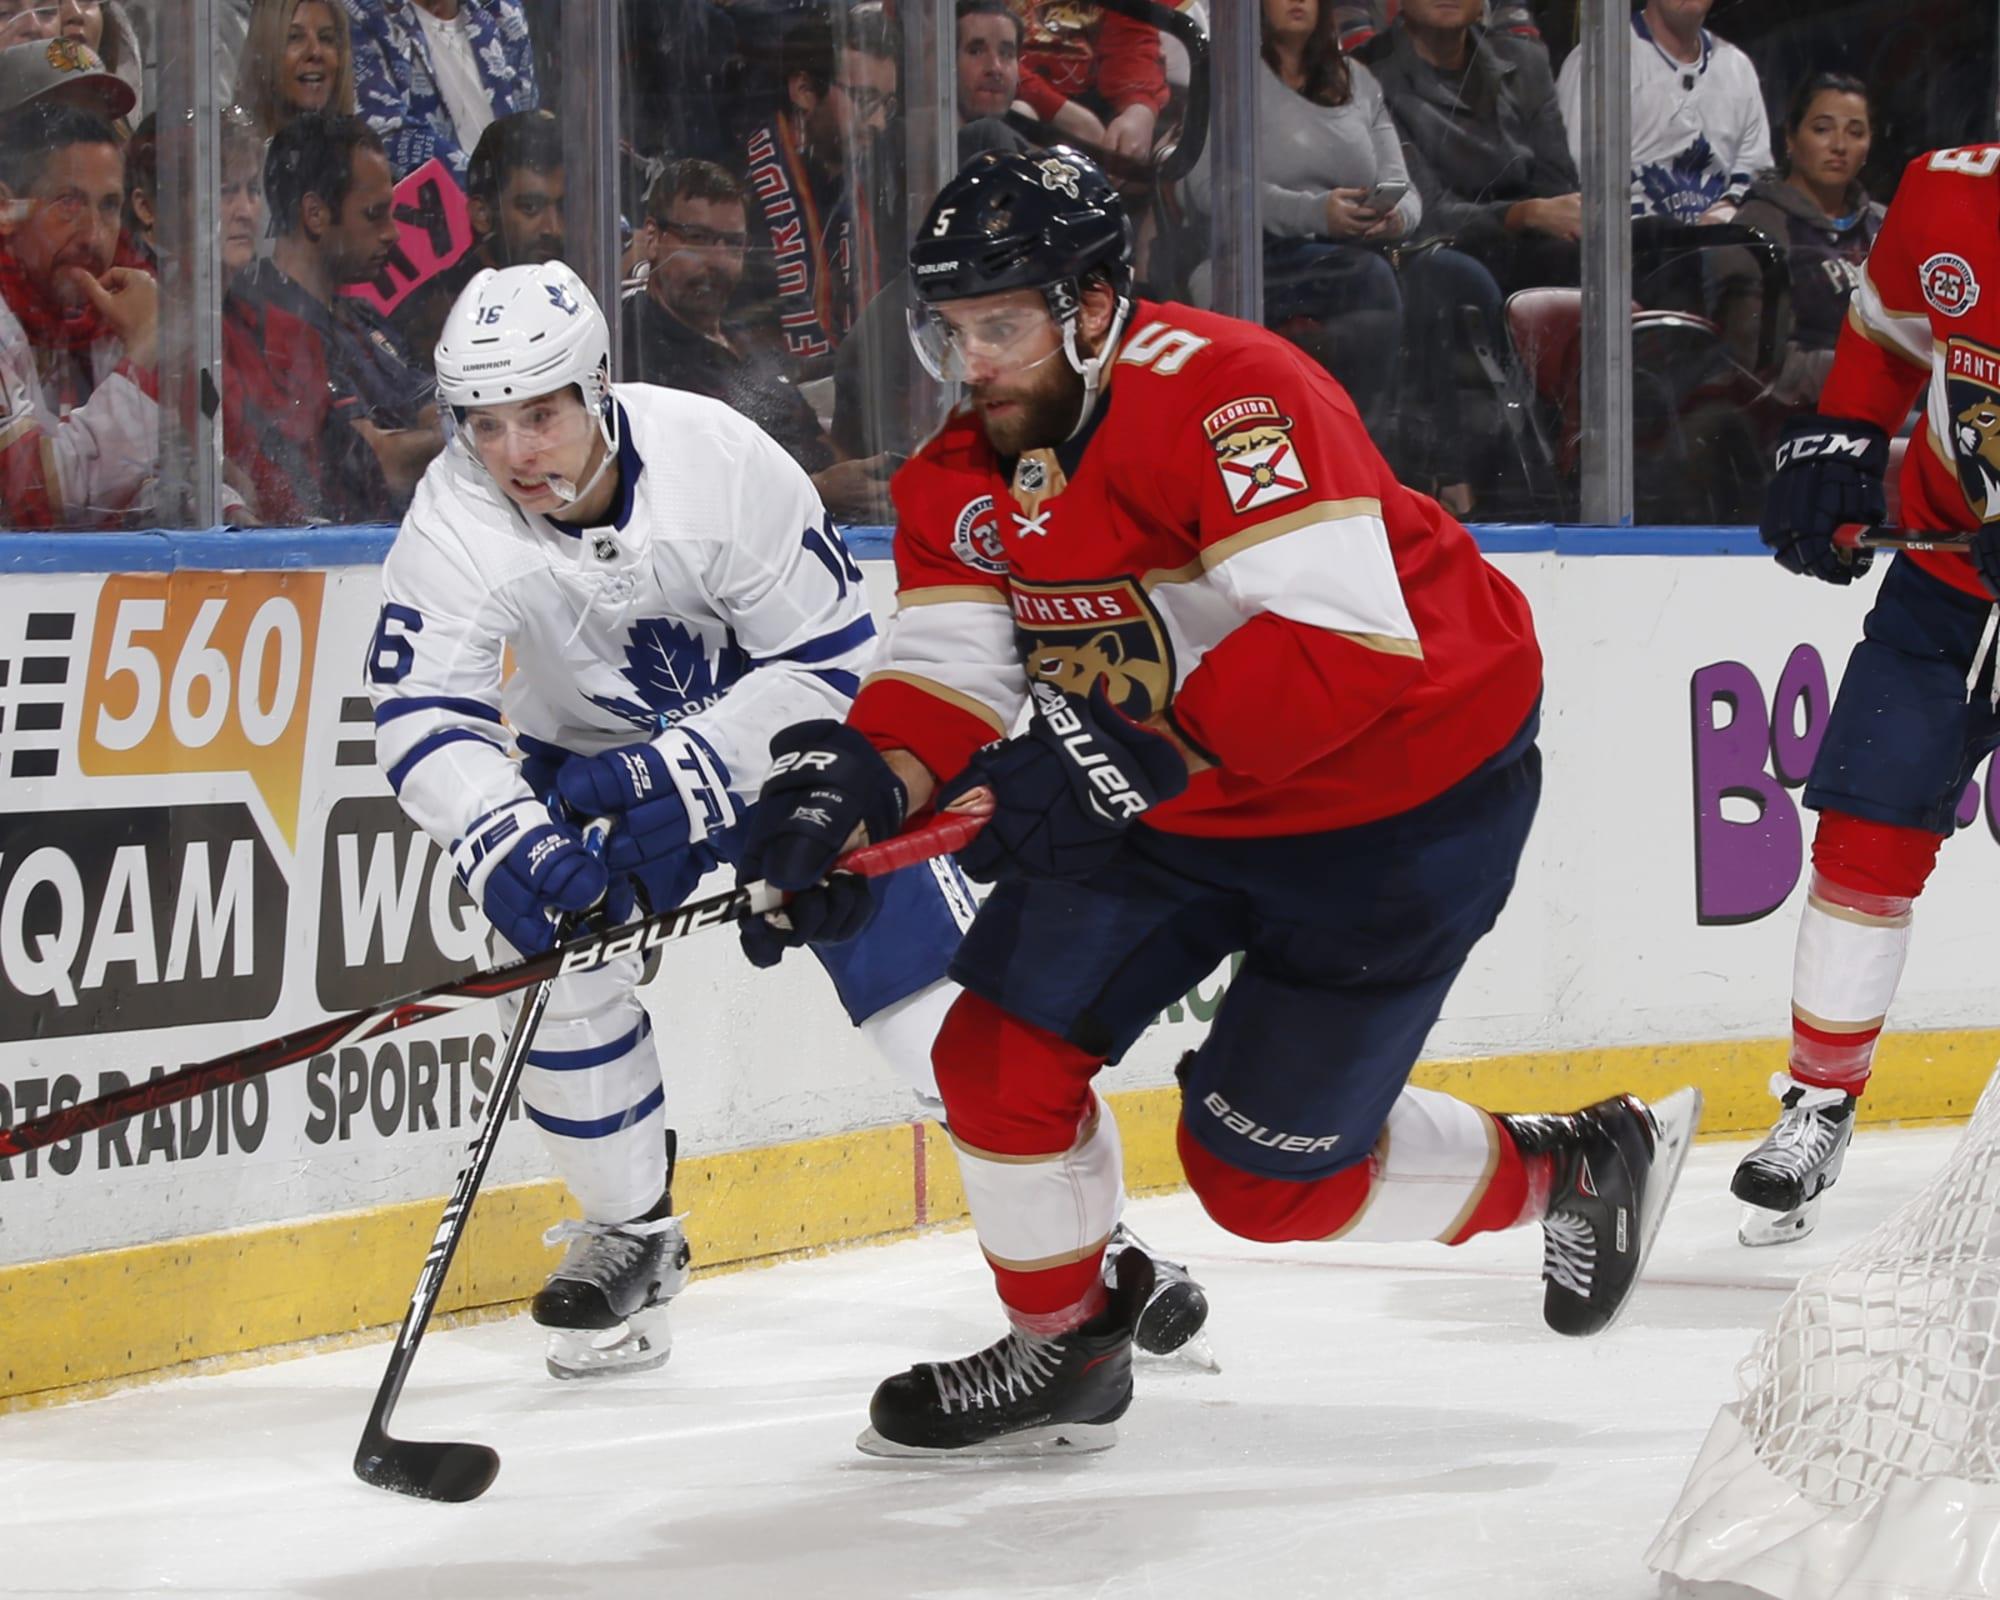 Toronto Maple Leafs: 10 Defenseman Not Named Pietrangelo to Pursue